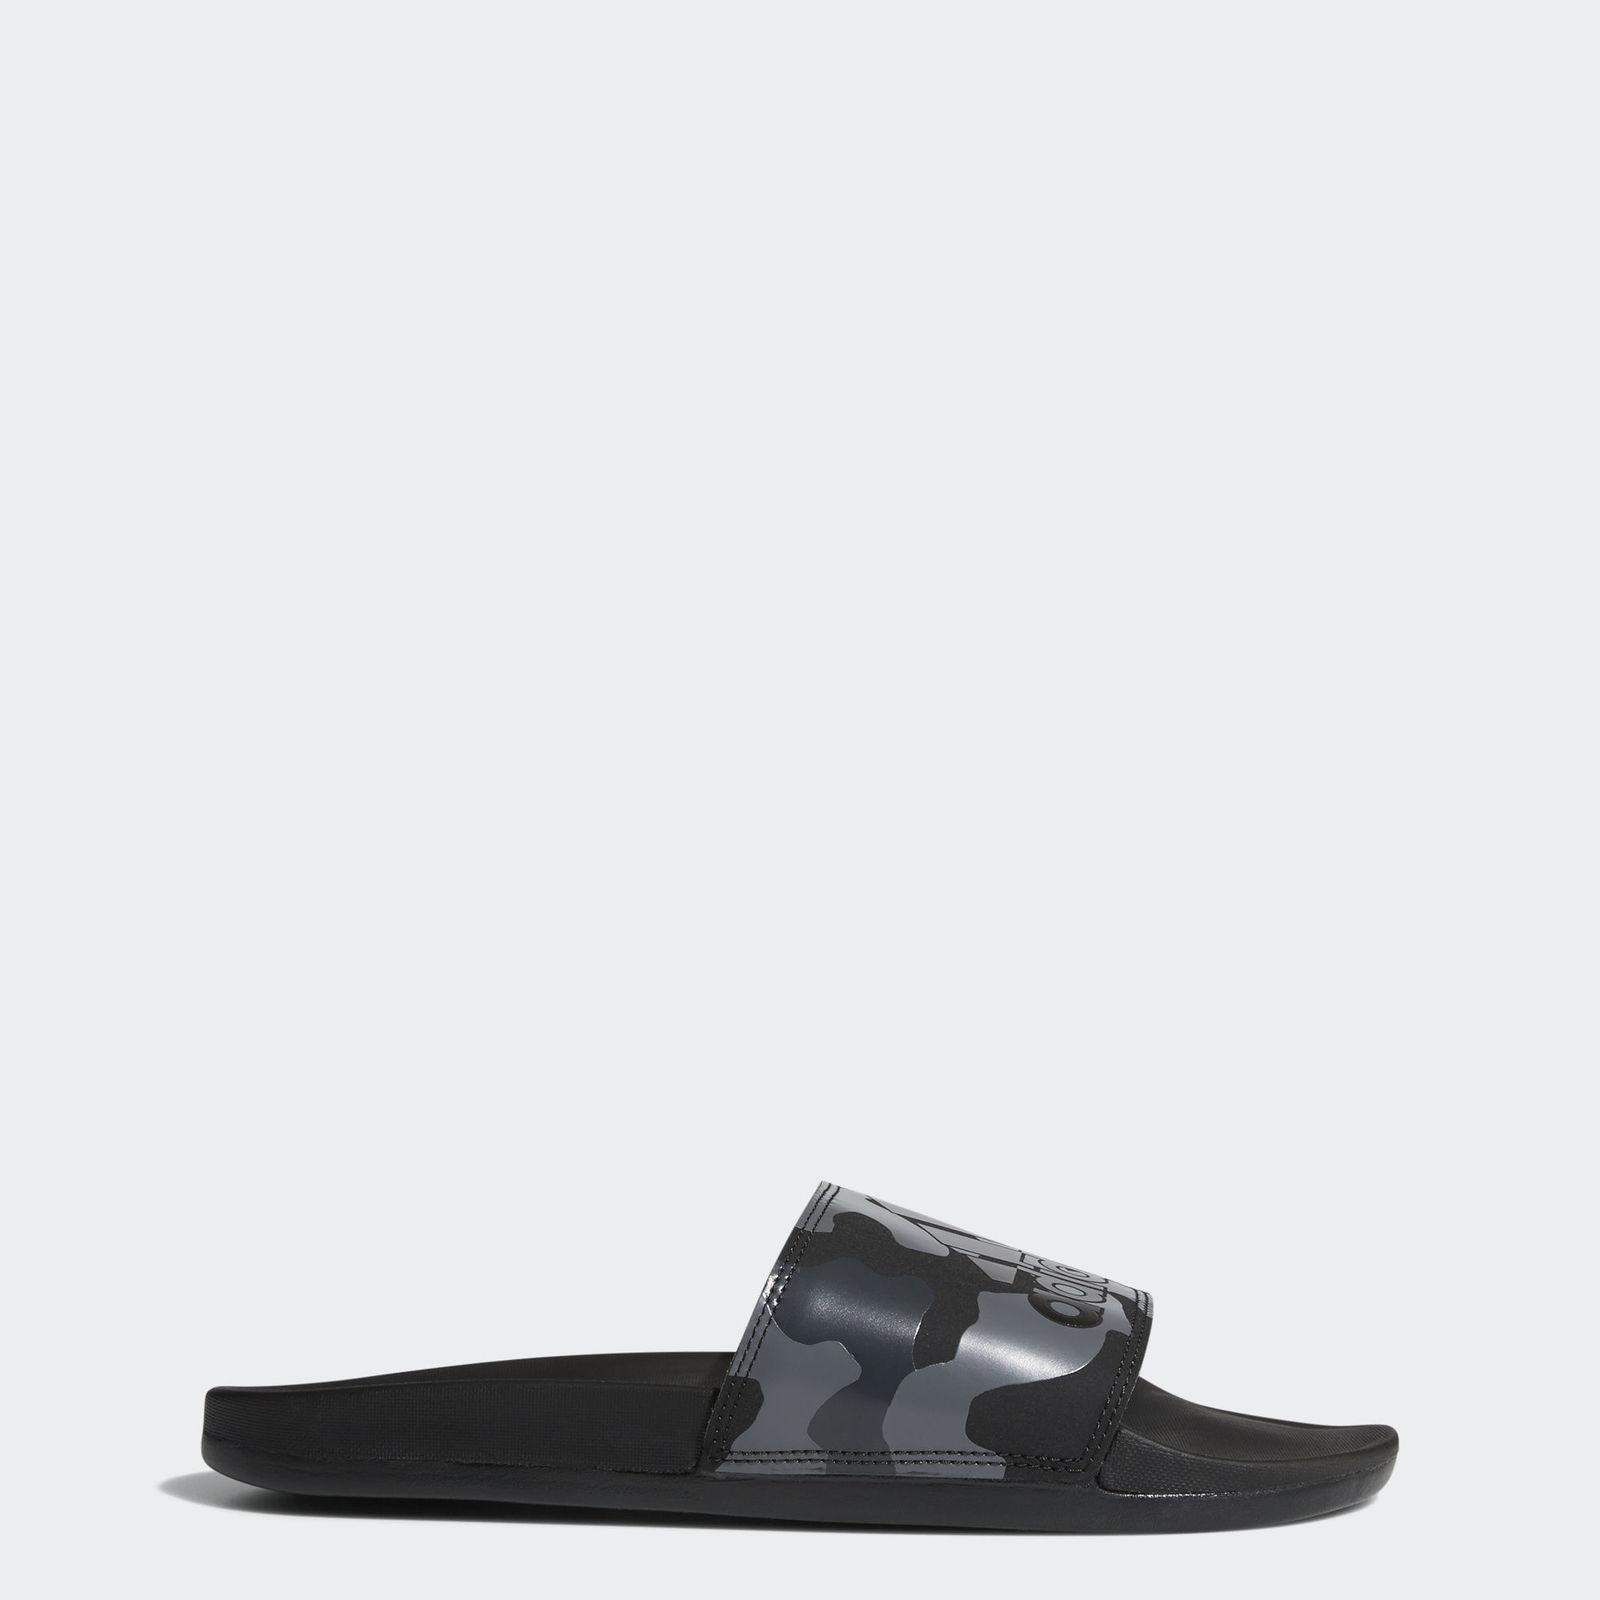 b410e45fa4a1 Adidas Apparel  Shoes Slides